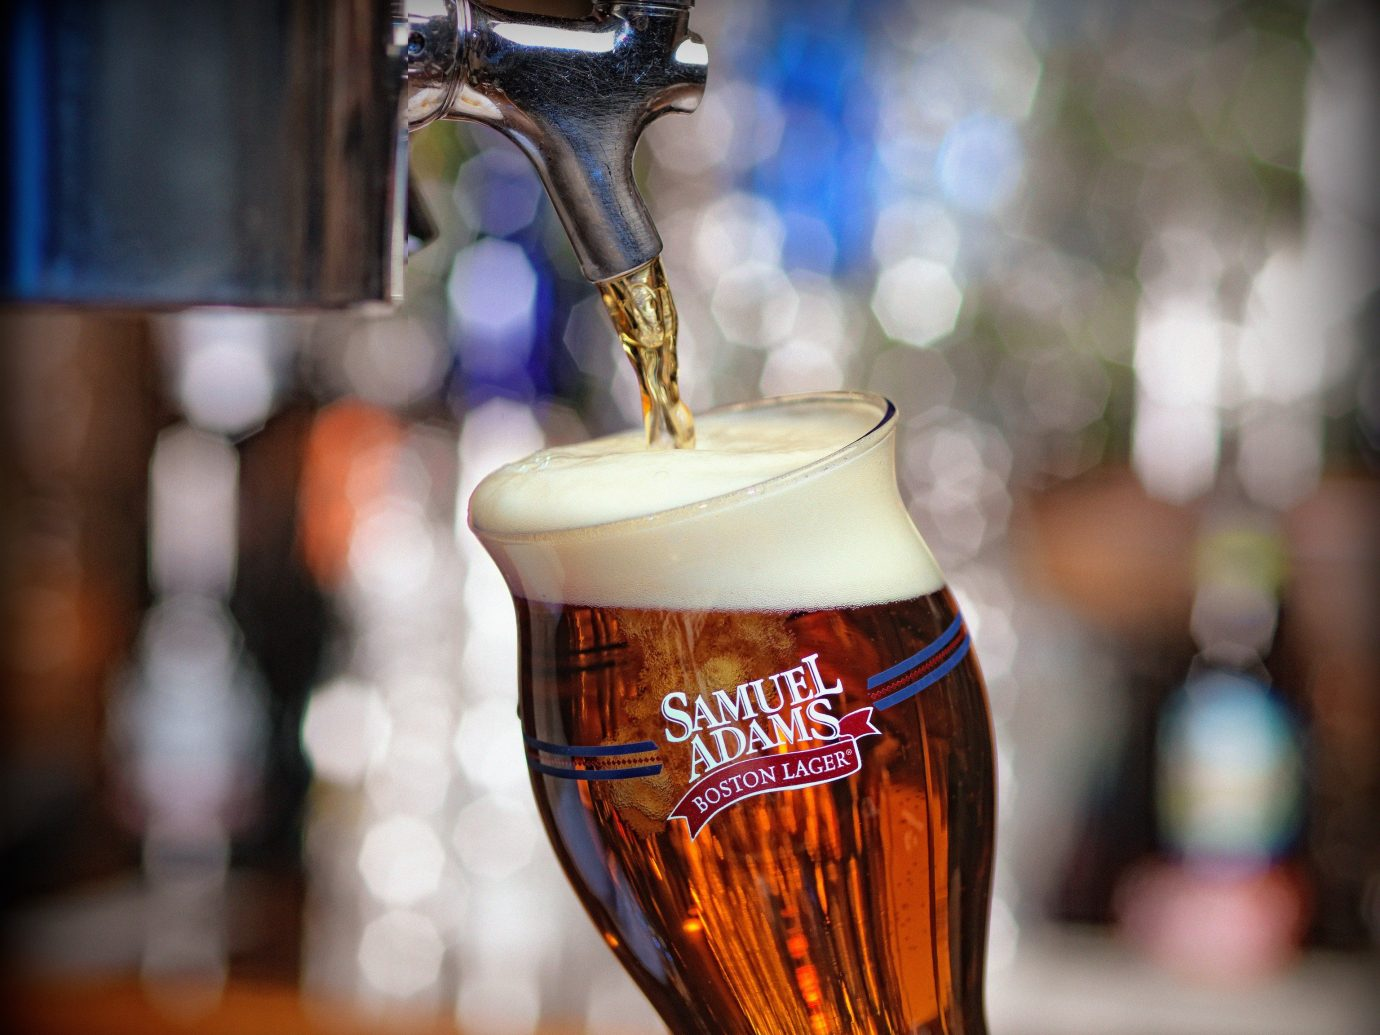 Budget Drink beer alcoholic beverage alcohol sense glass pint us